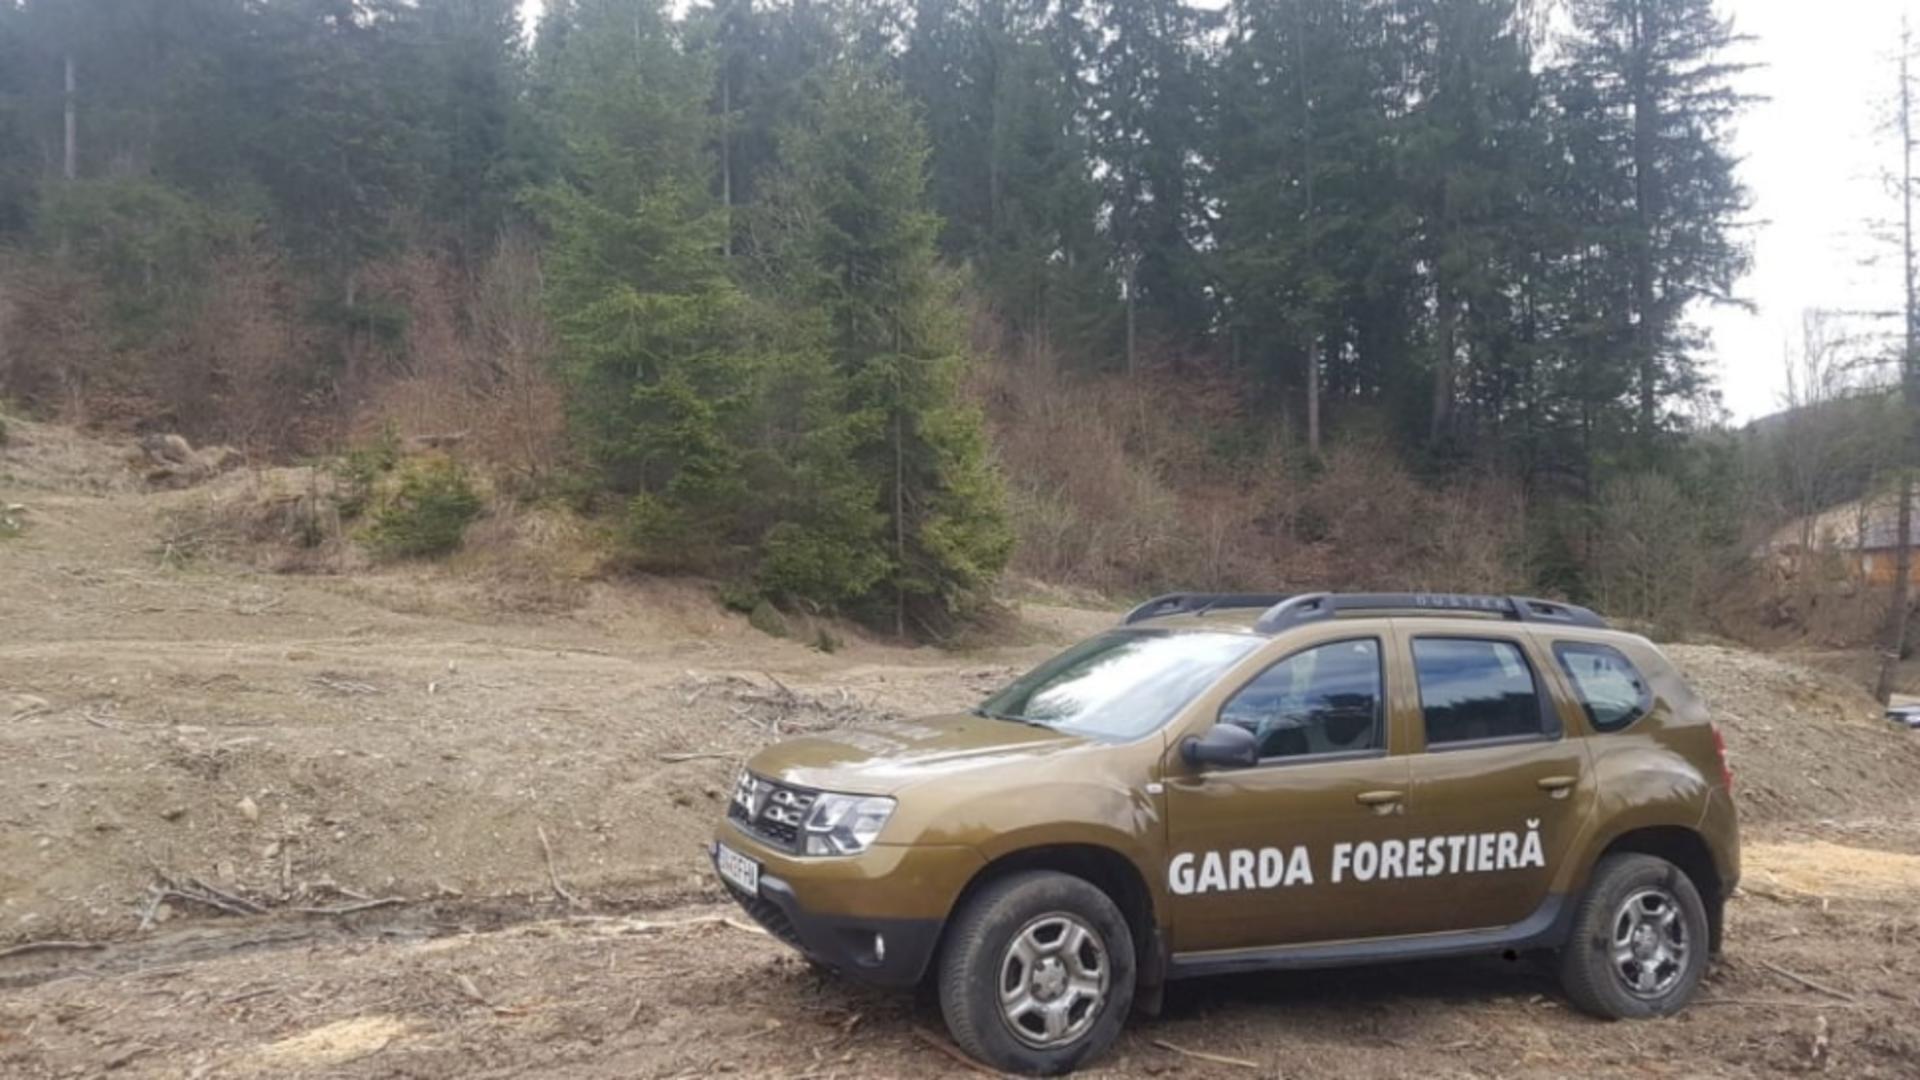 Masina Gărzii Forestiere Suceava